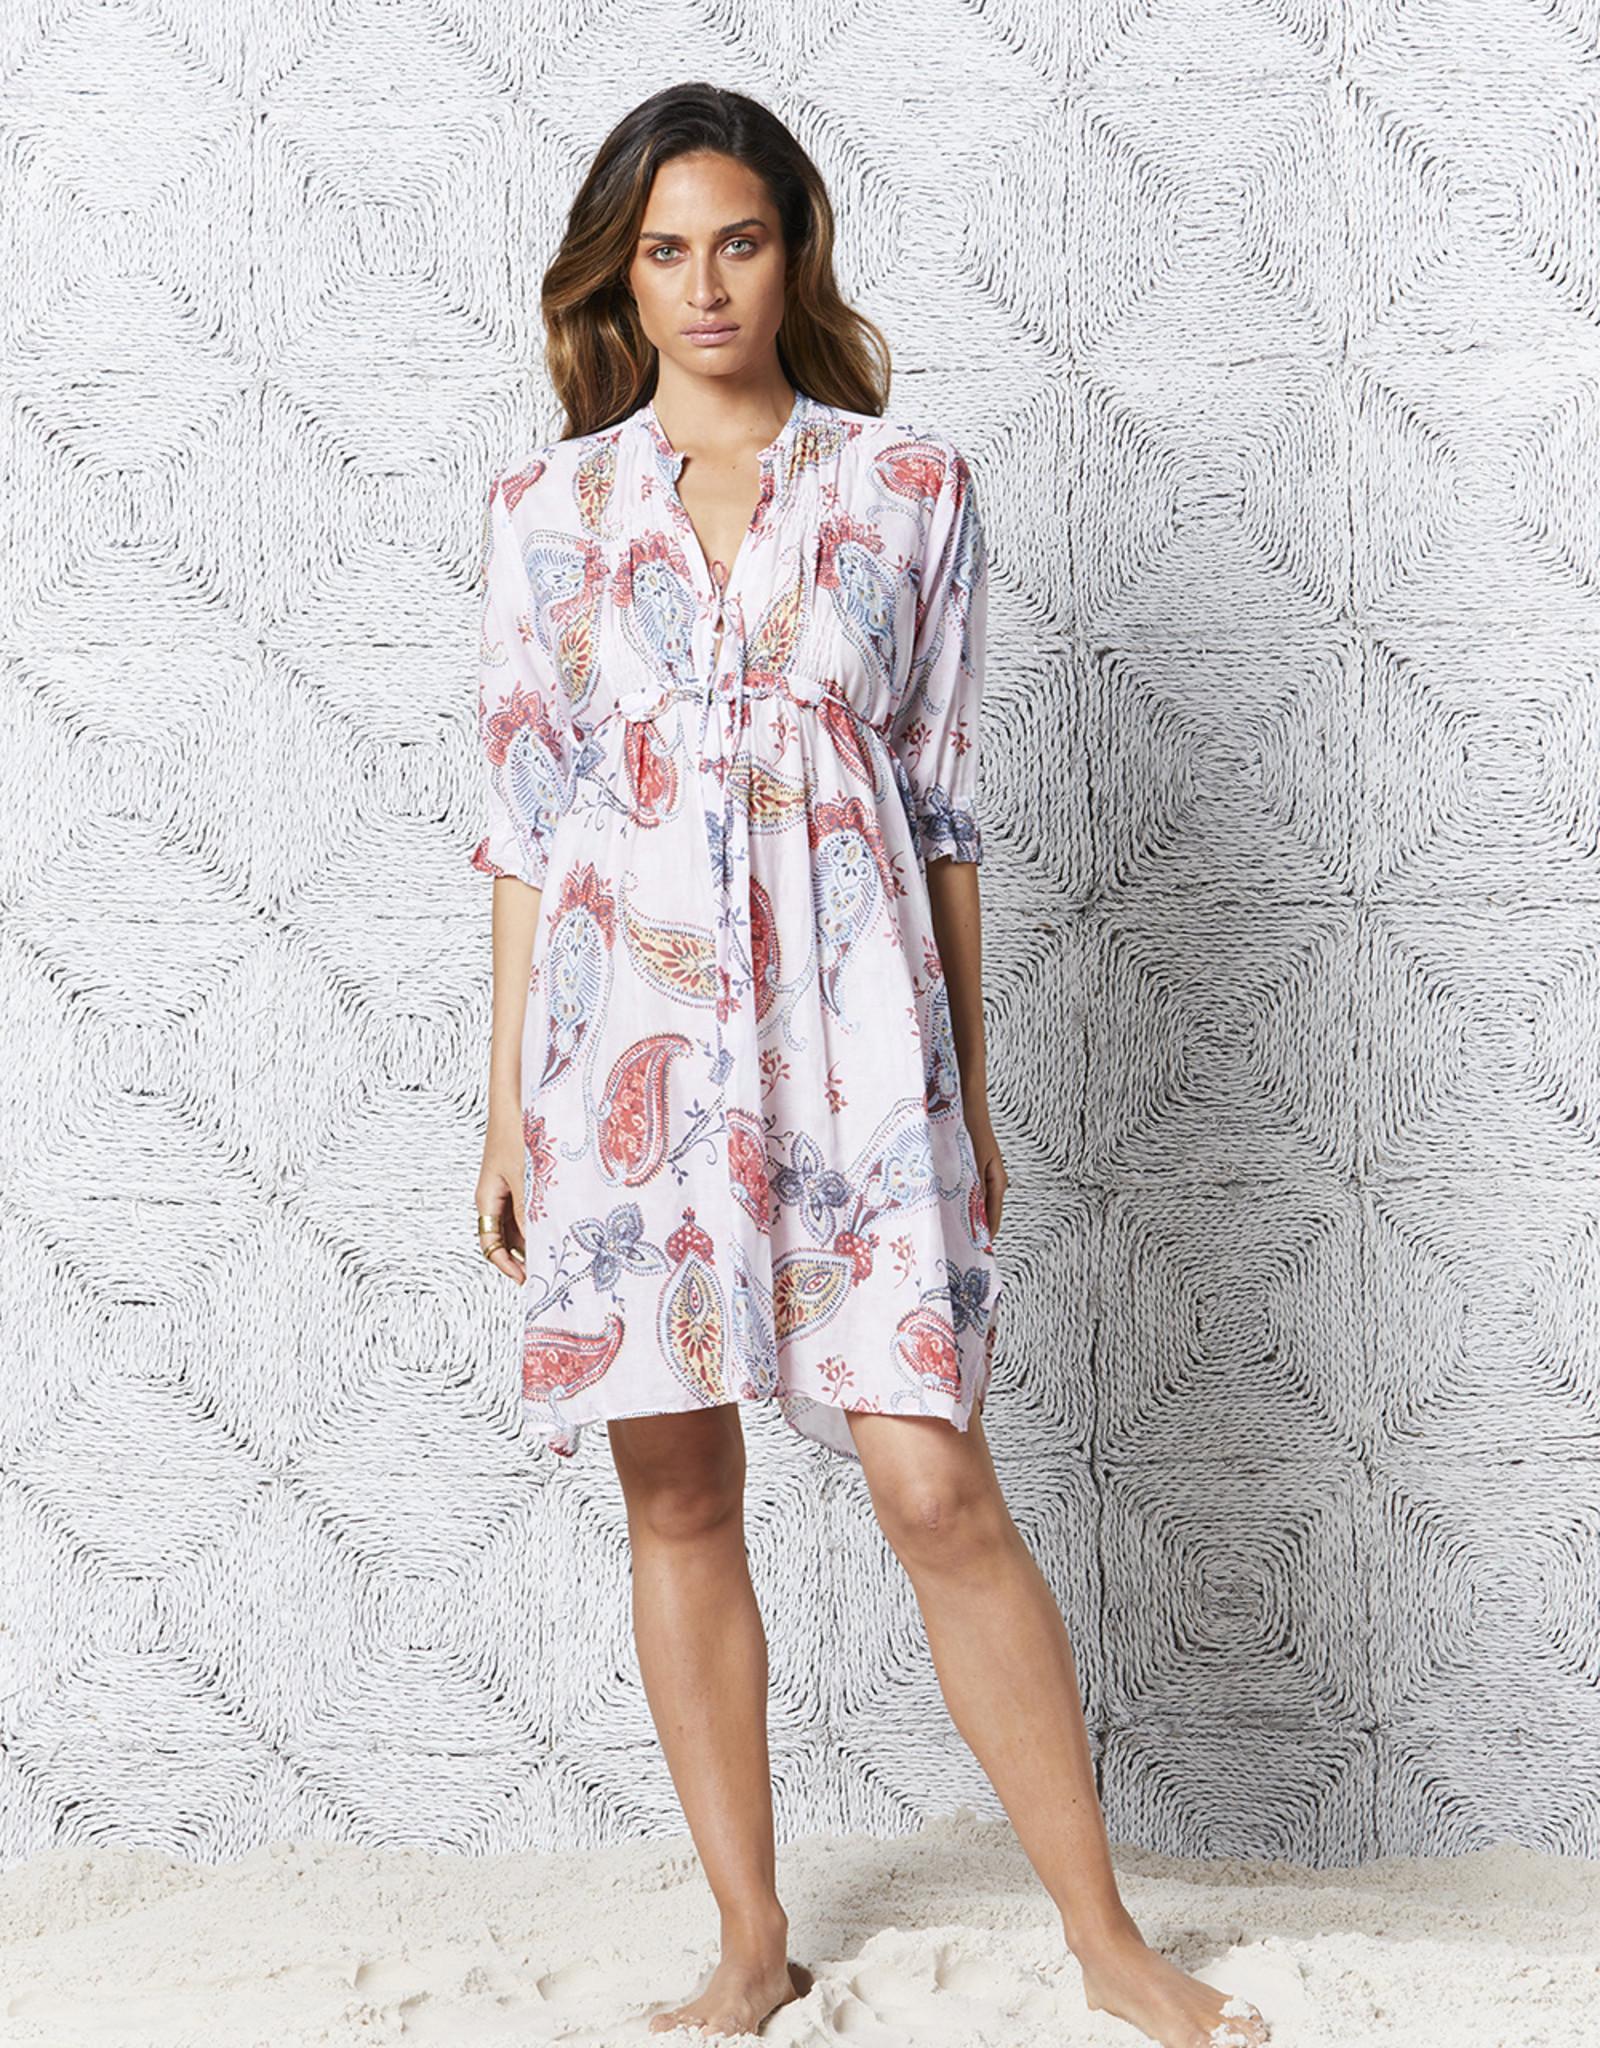 ONESEASON AUDREY DRESS CROATIA